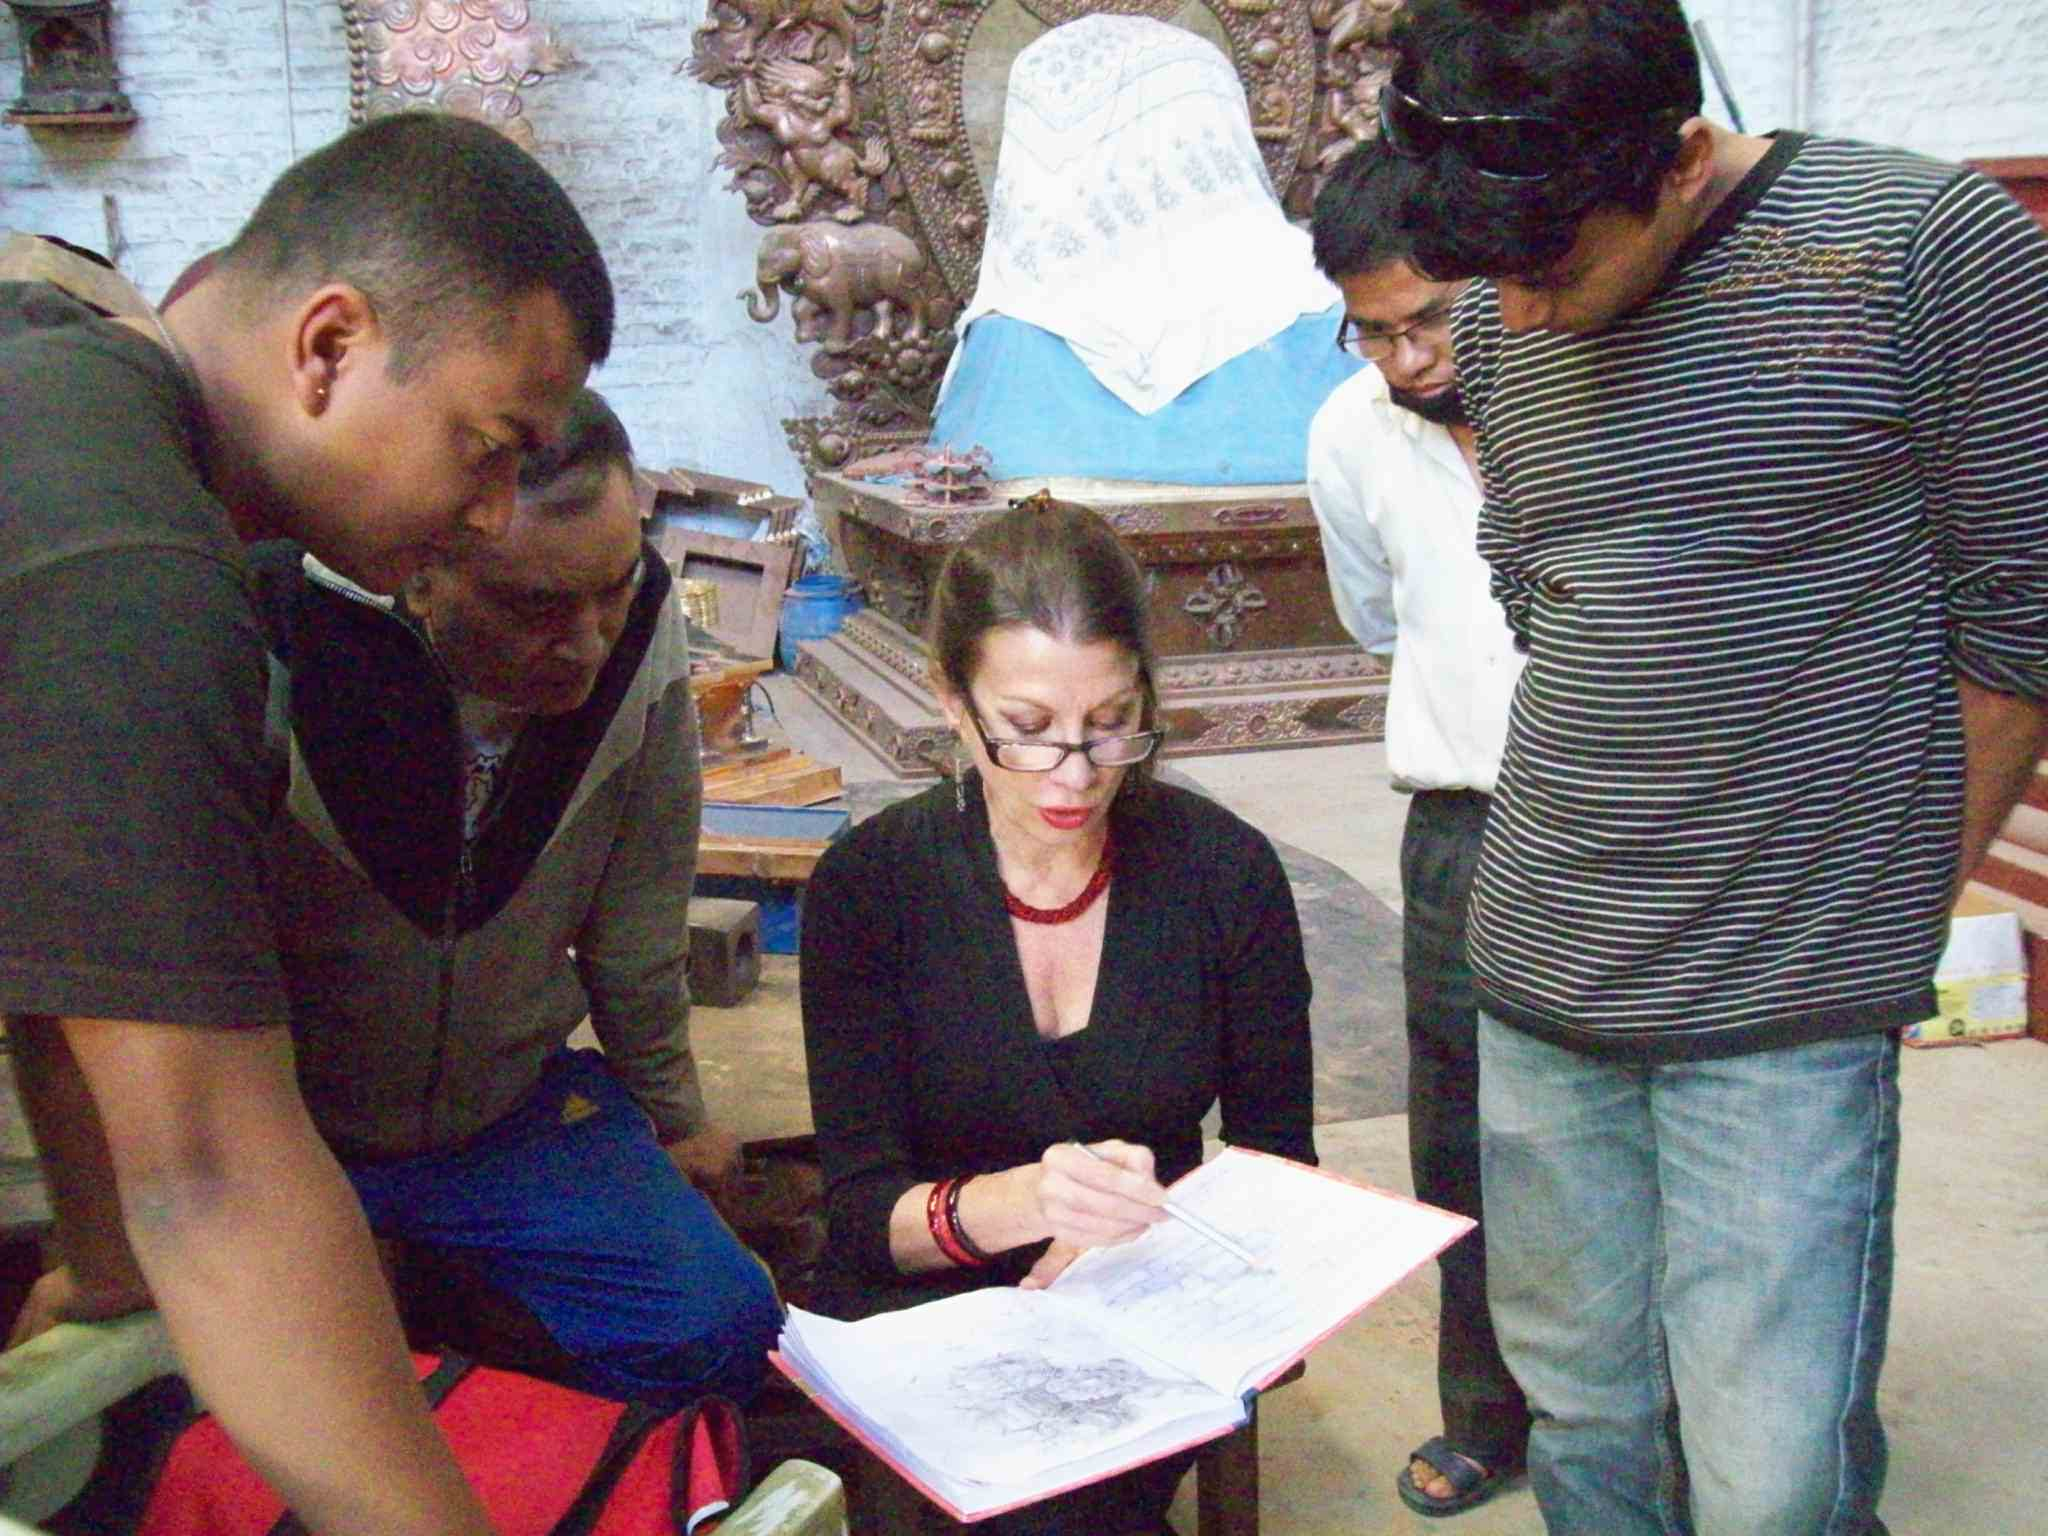 Drdak explains new project to the artisans of Rabindra Shakya's Image Atelier, Patan, 2015.